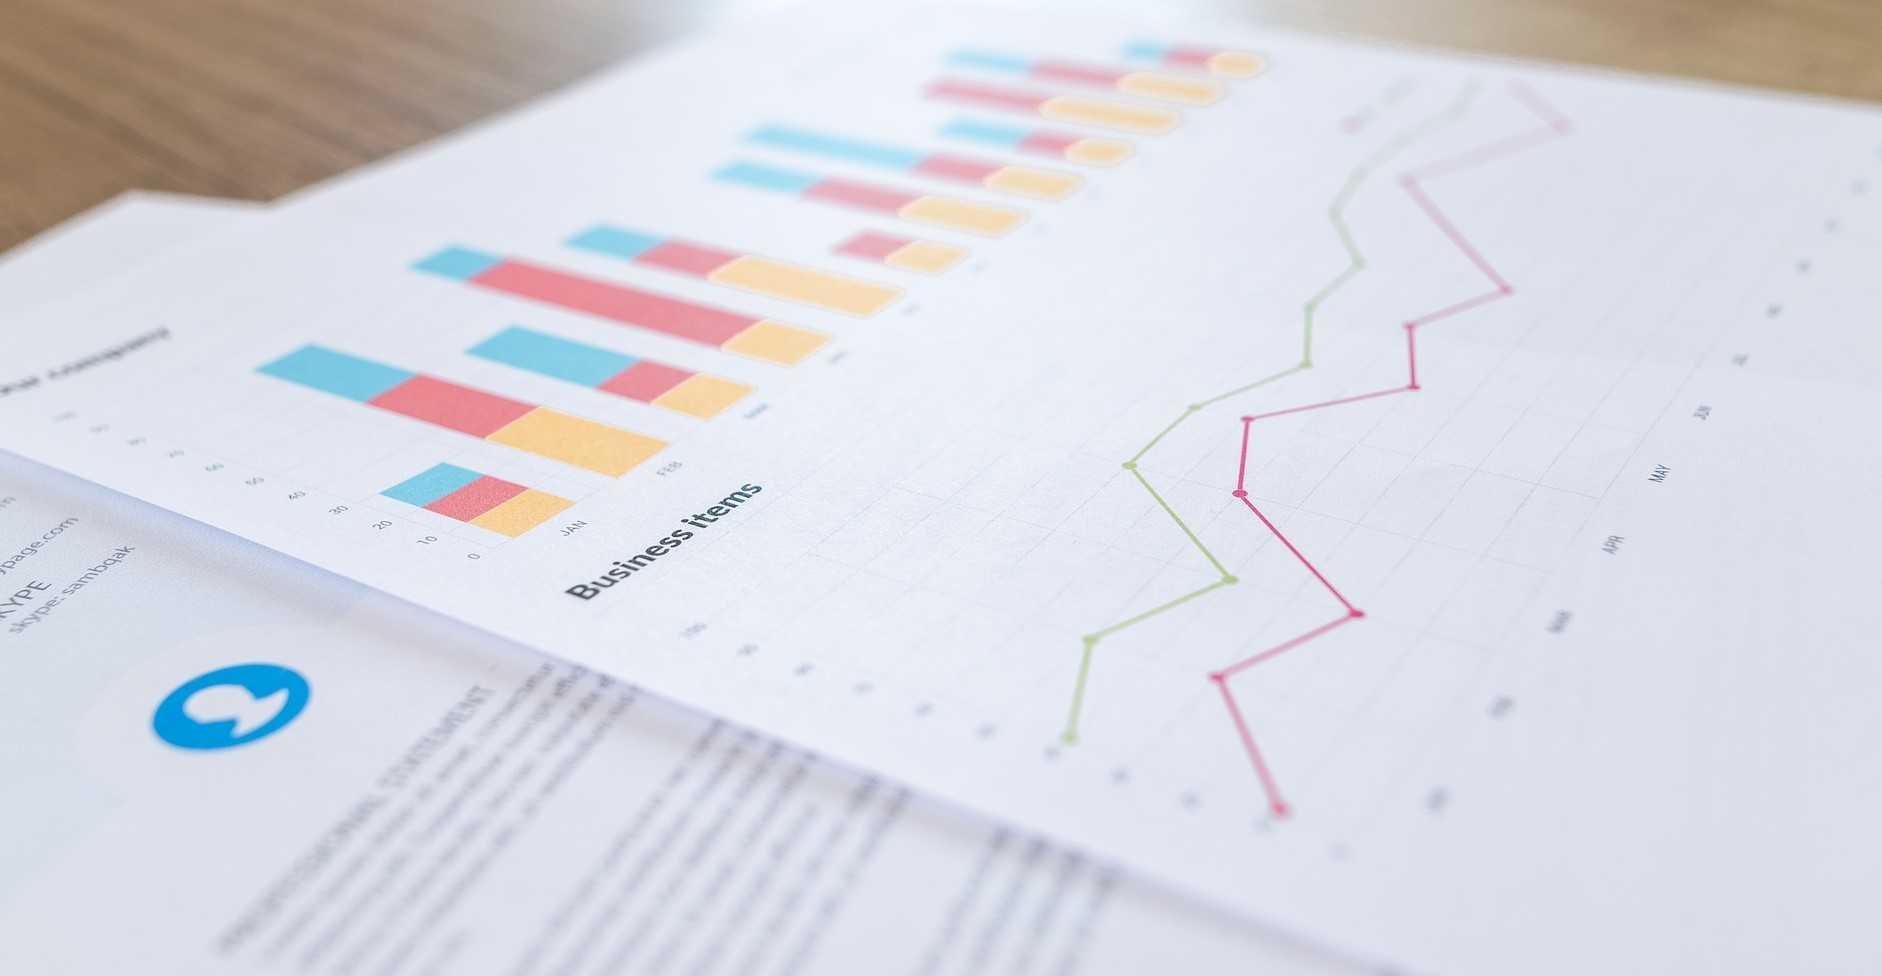 Create an annual report